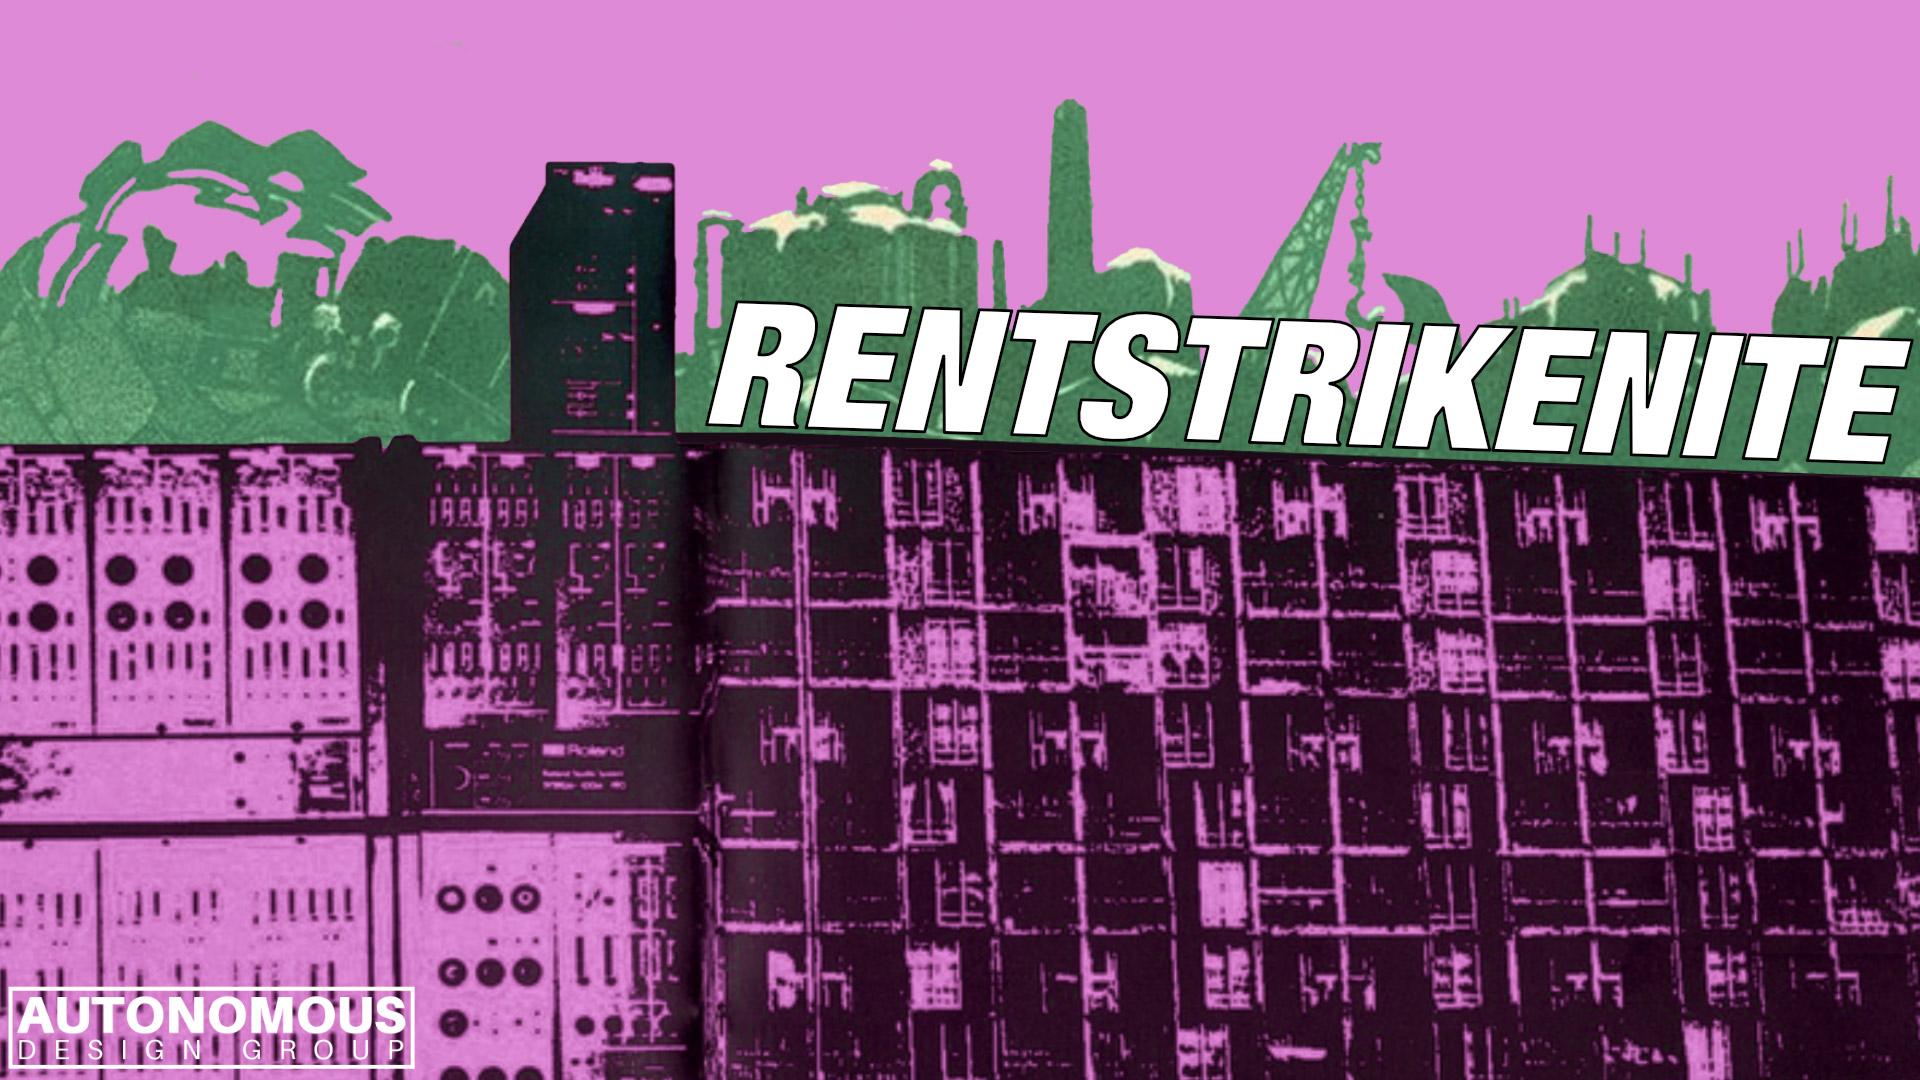 rent strike nite